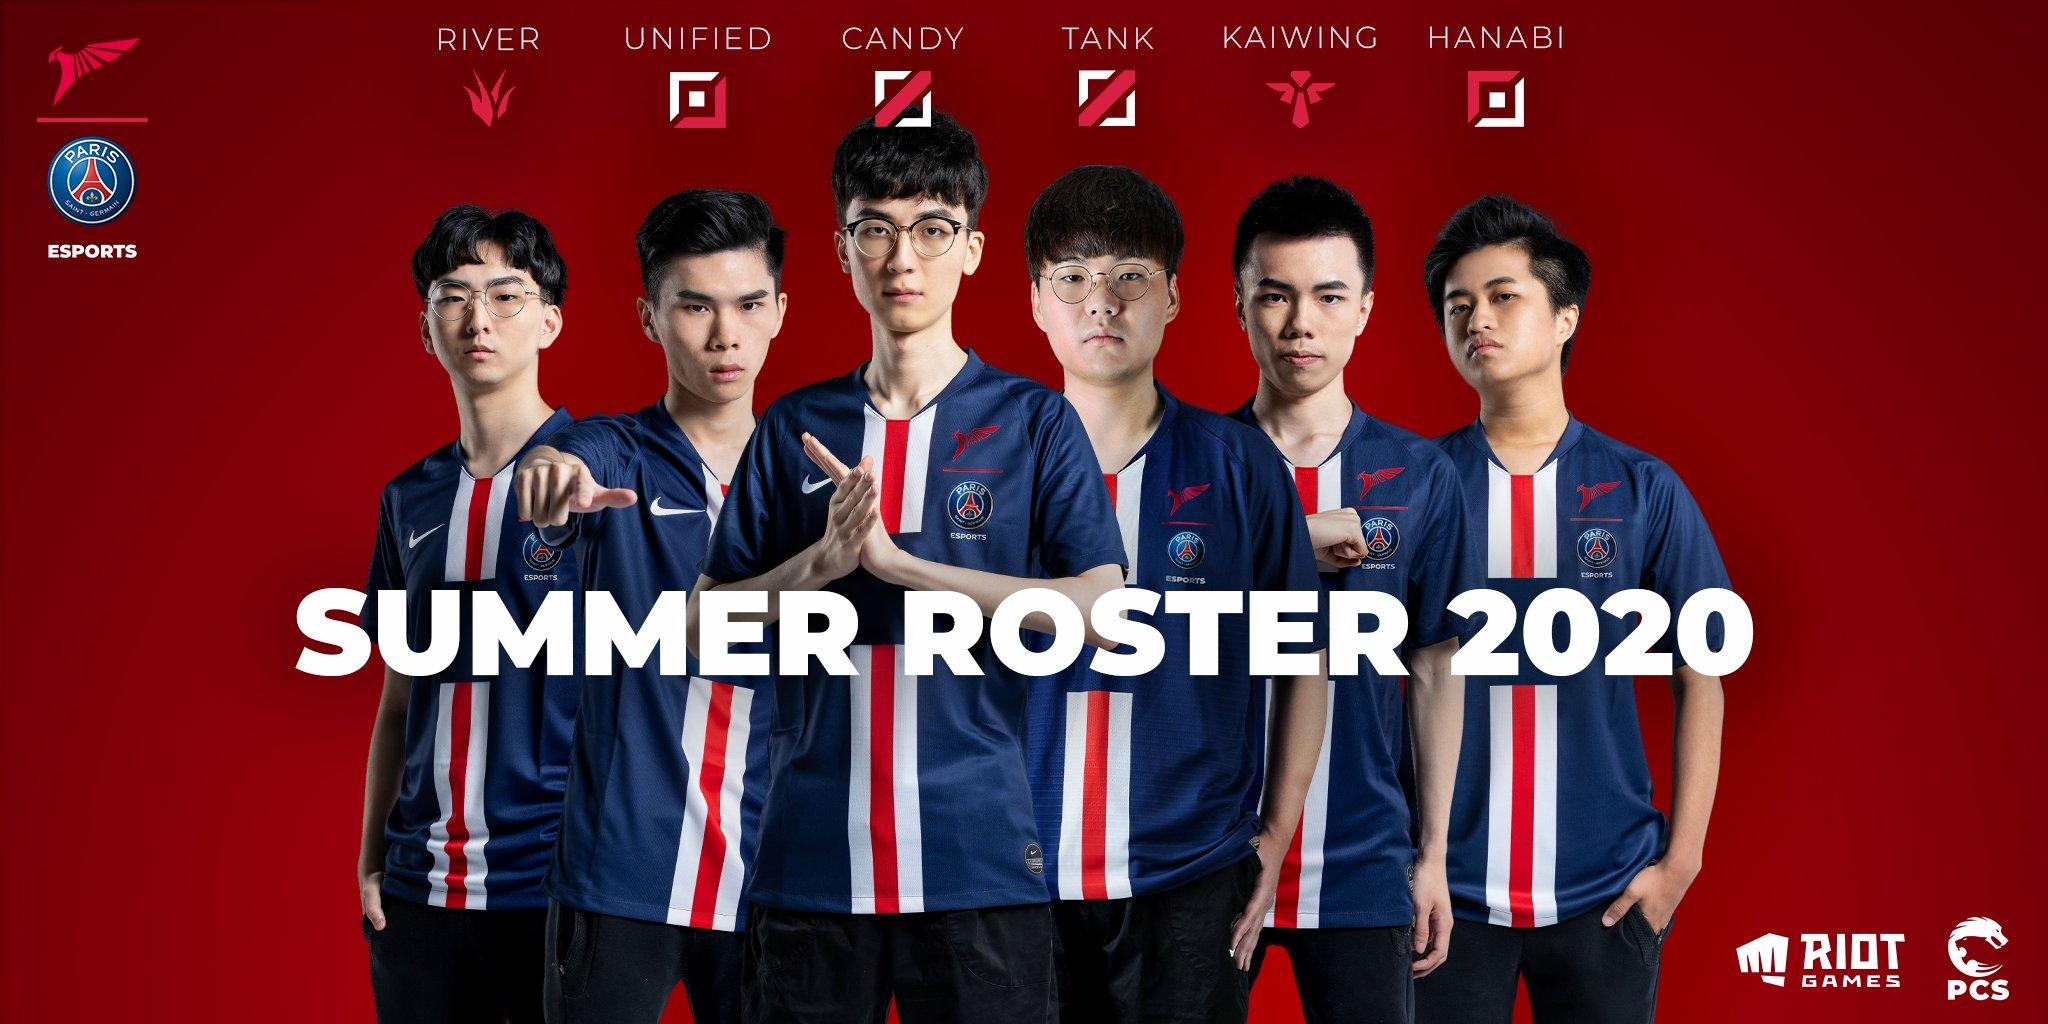 Psg Talon On Twitter Introducing Psg Talon Lol Roster For The 2020 Summer Split For Pcs Those Uniforms Looking Pcslol Bleedcrimson Psg Https T Co Bjgpgnuibo